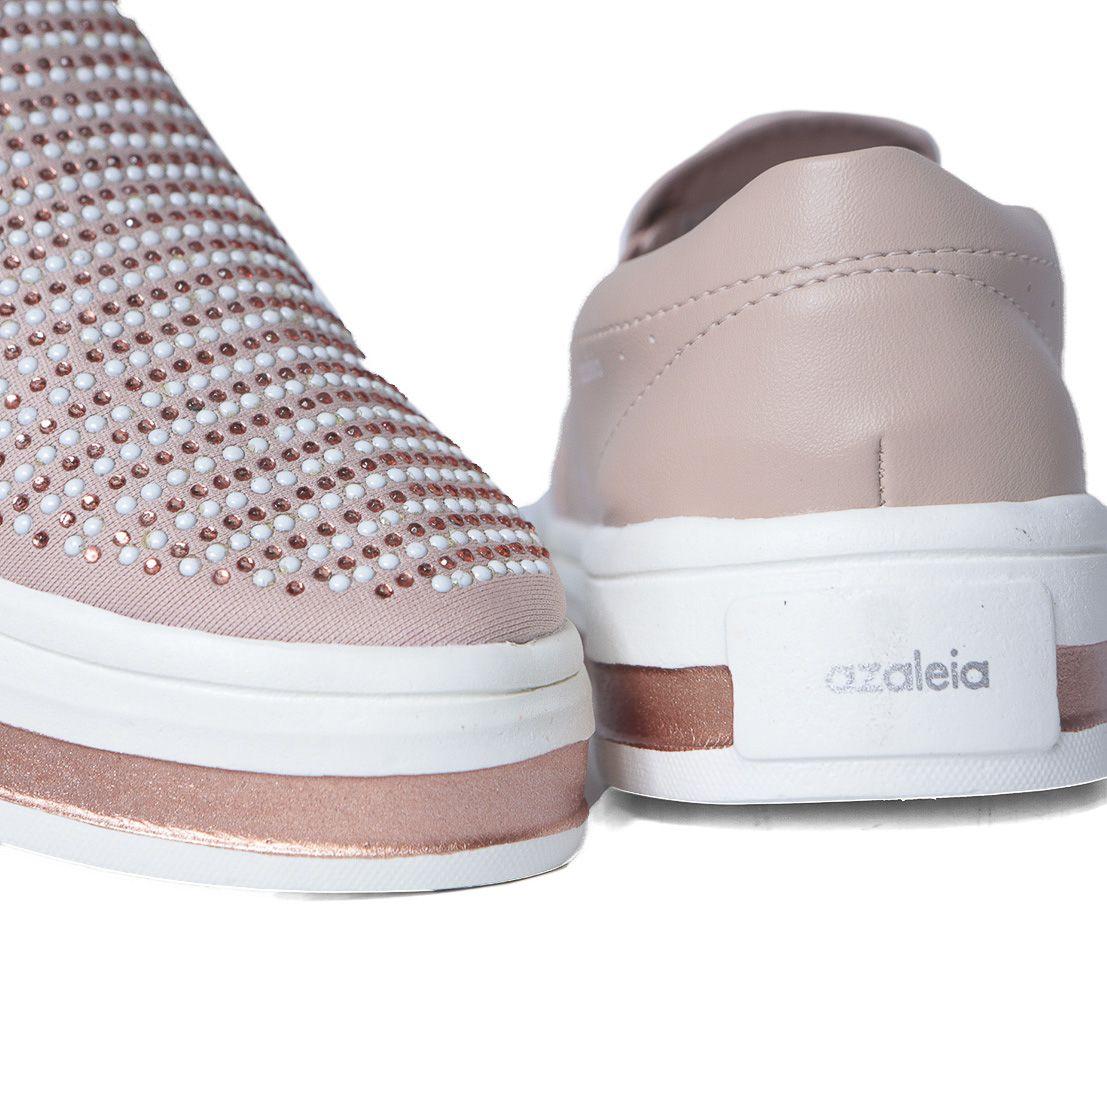 Tênis Casual Slip On Feminino Flatform Azaleia 863/678